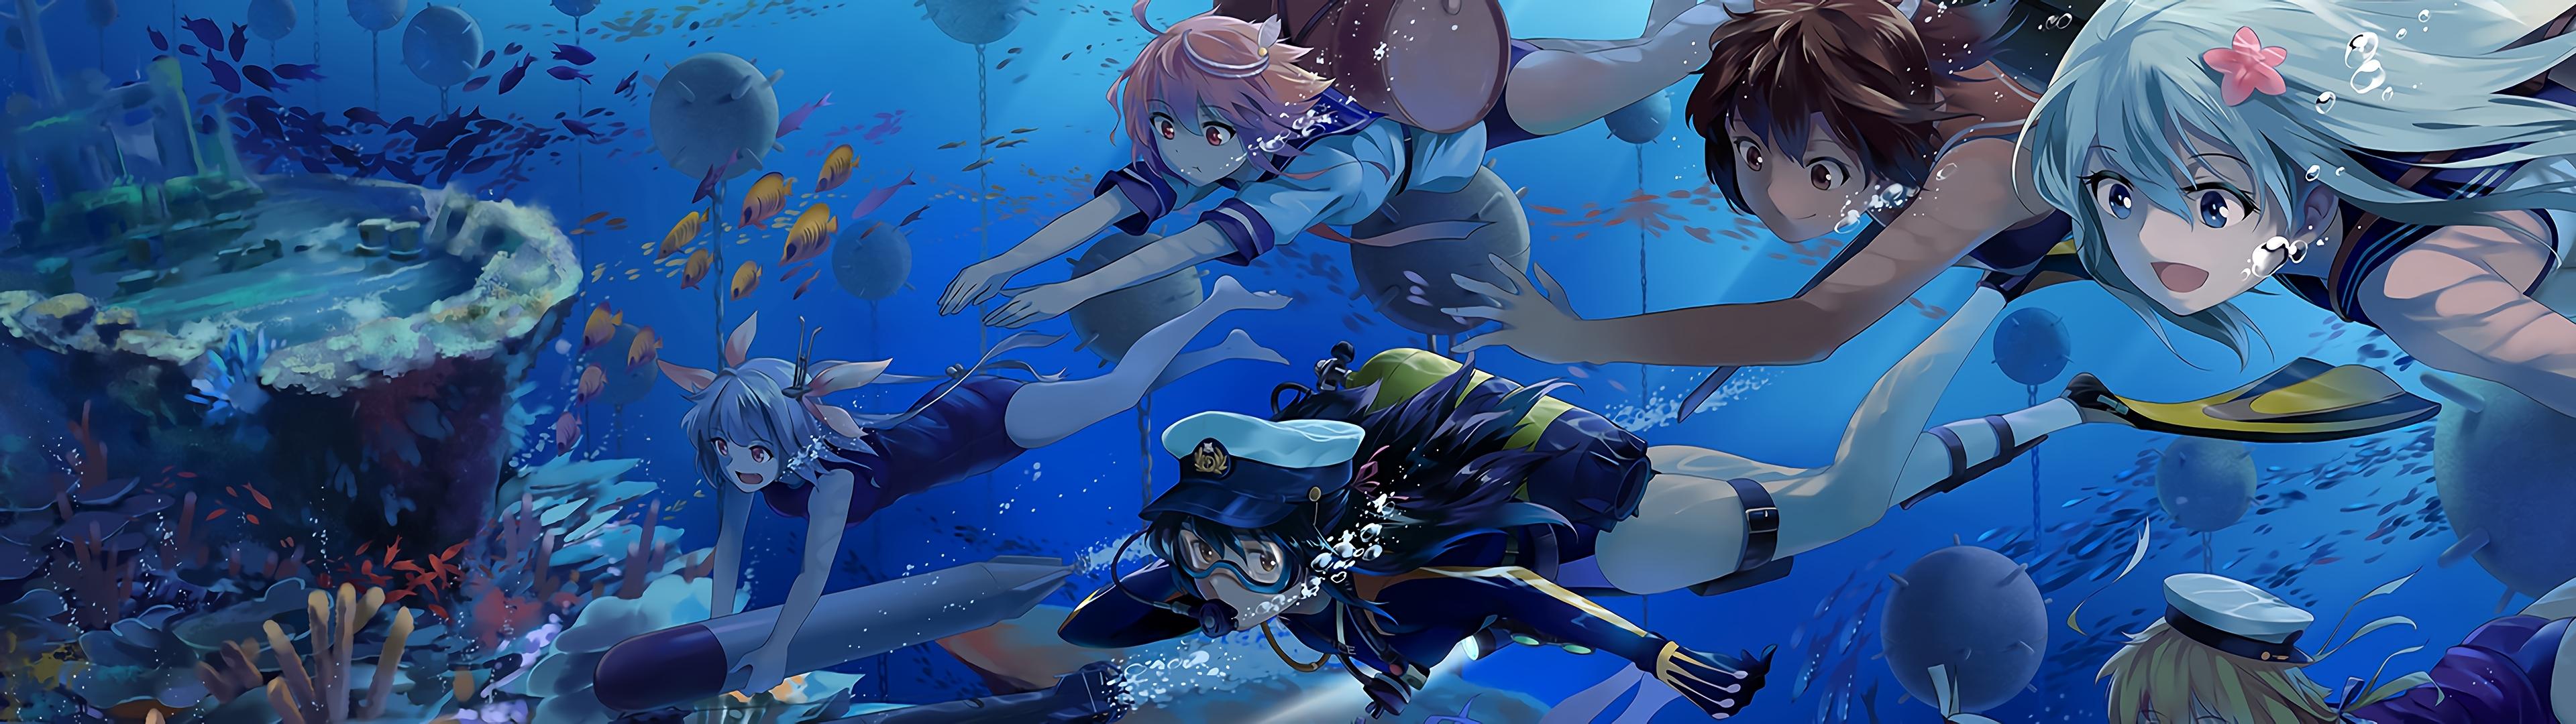 3840x1080] anime wallpaper - album on imgur